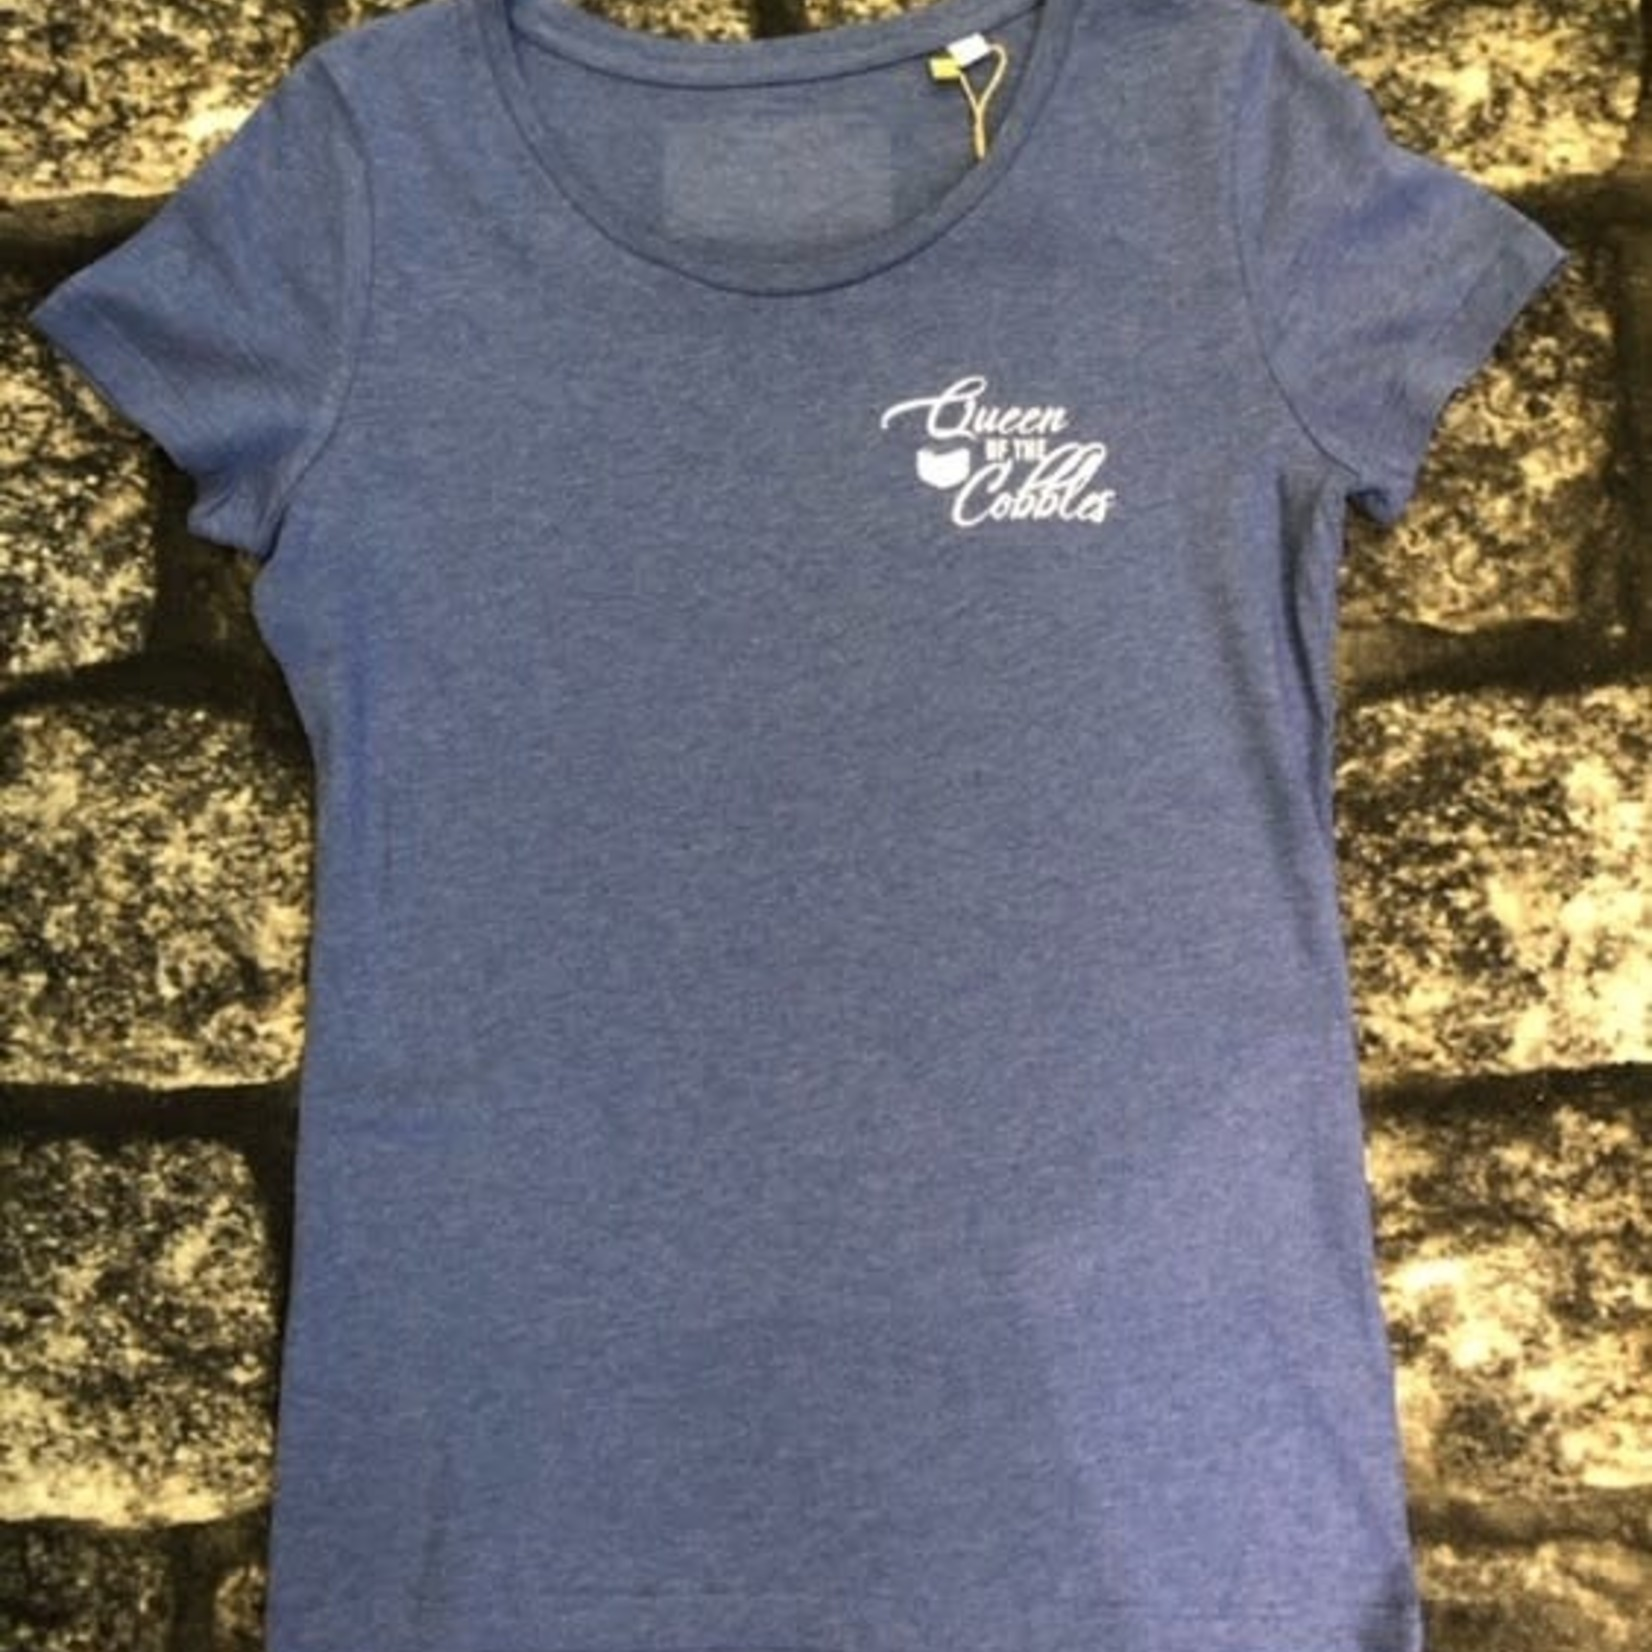 T-shirt 'Queen of the Cobbles' blue